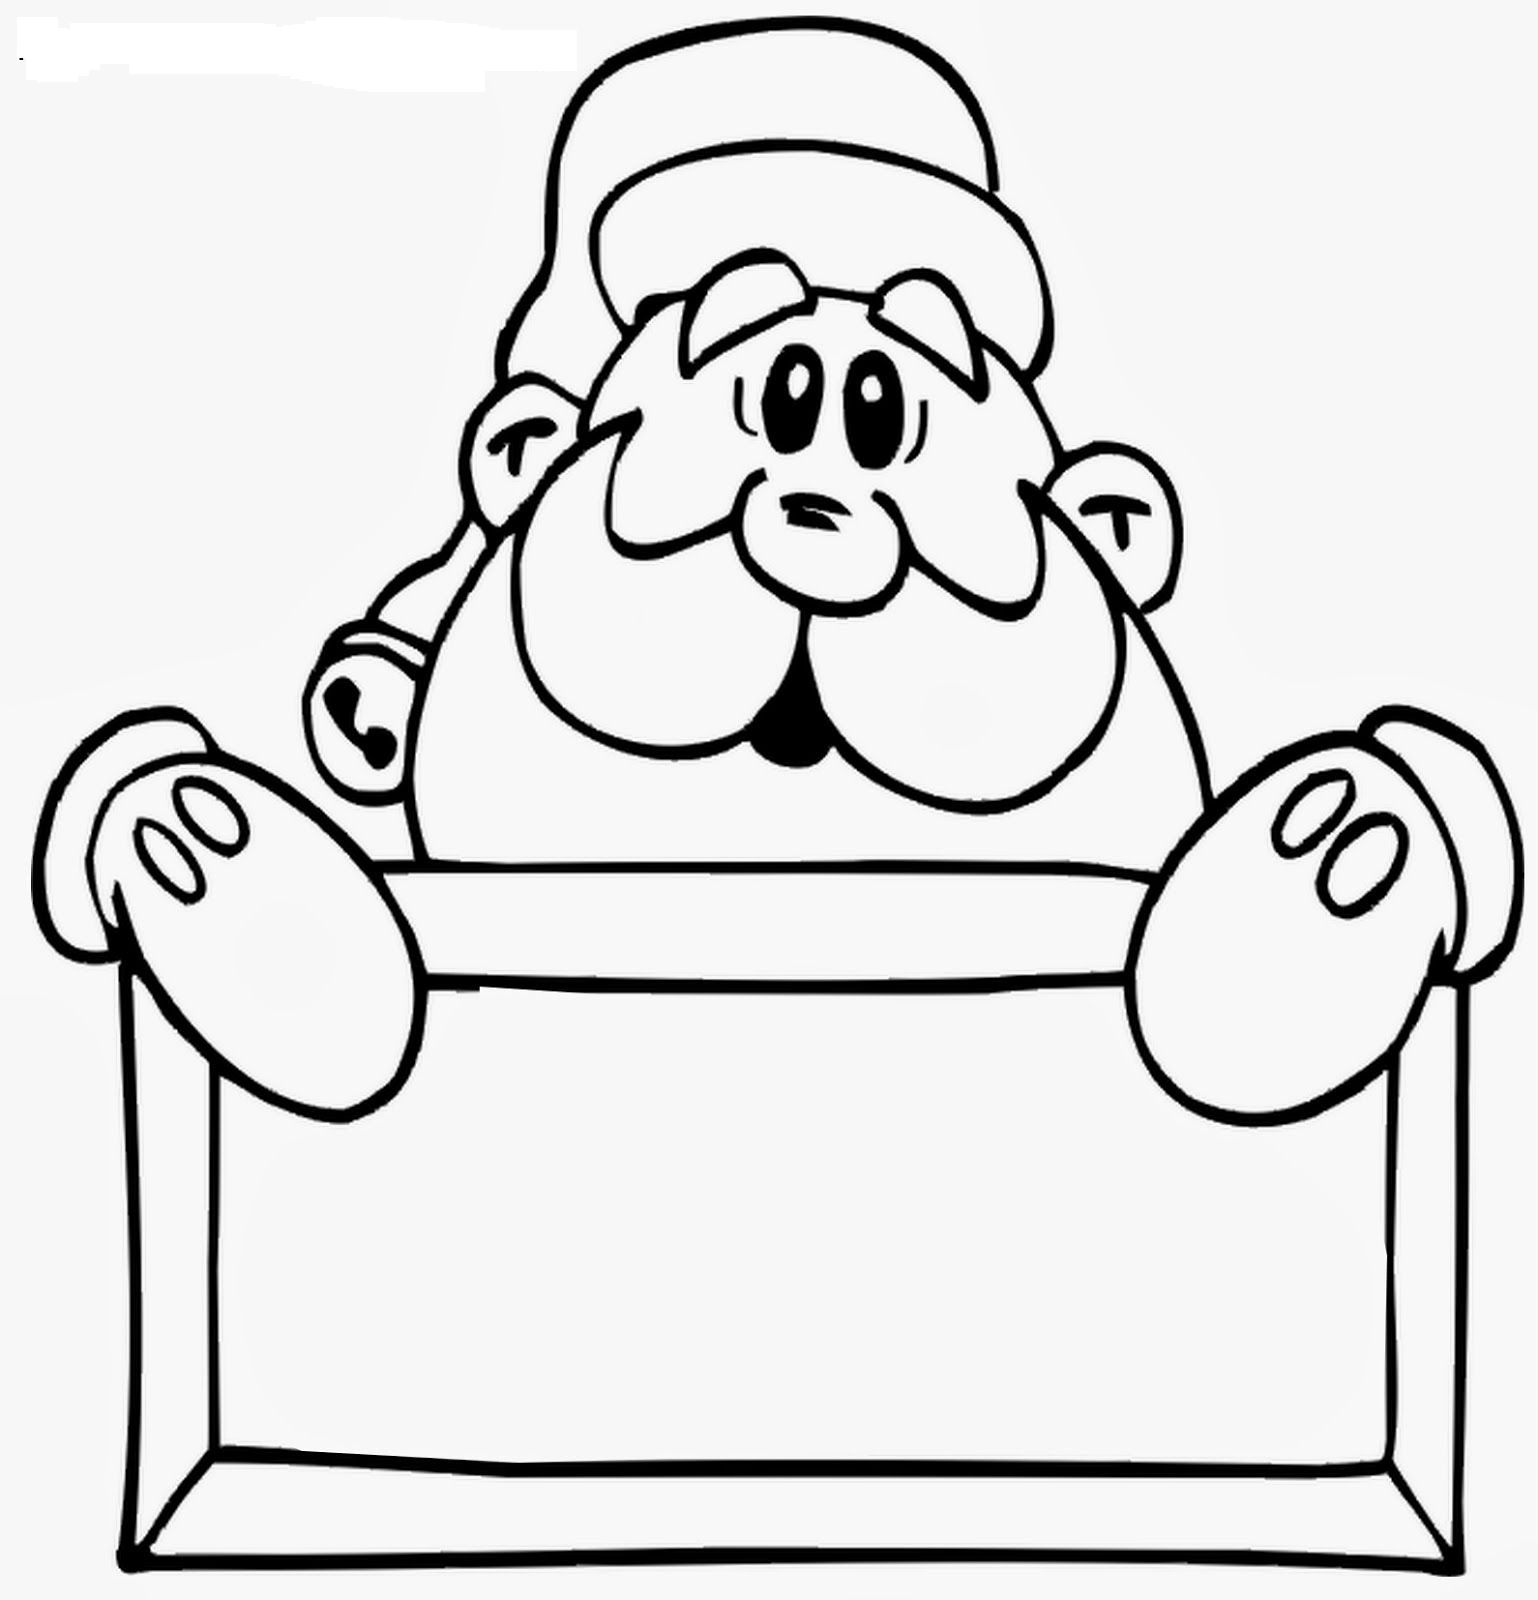 Imagens Para Colorir Do Papai Noel